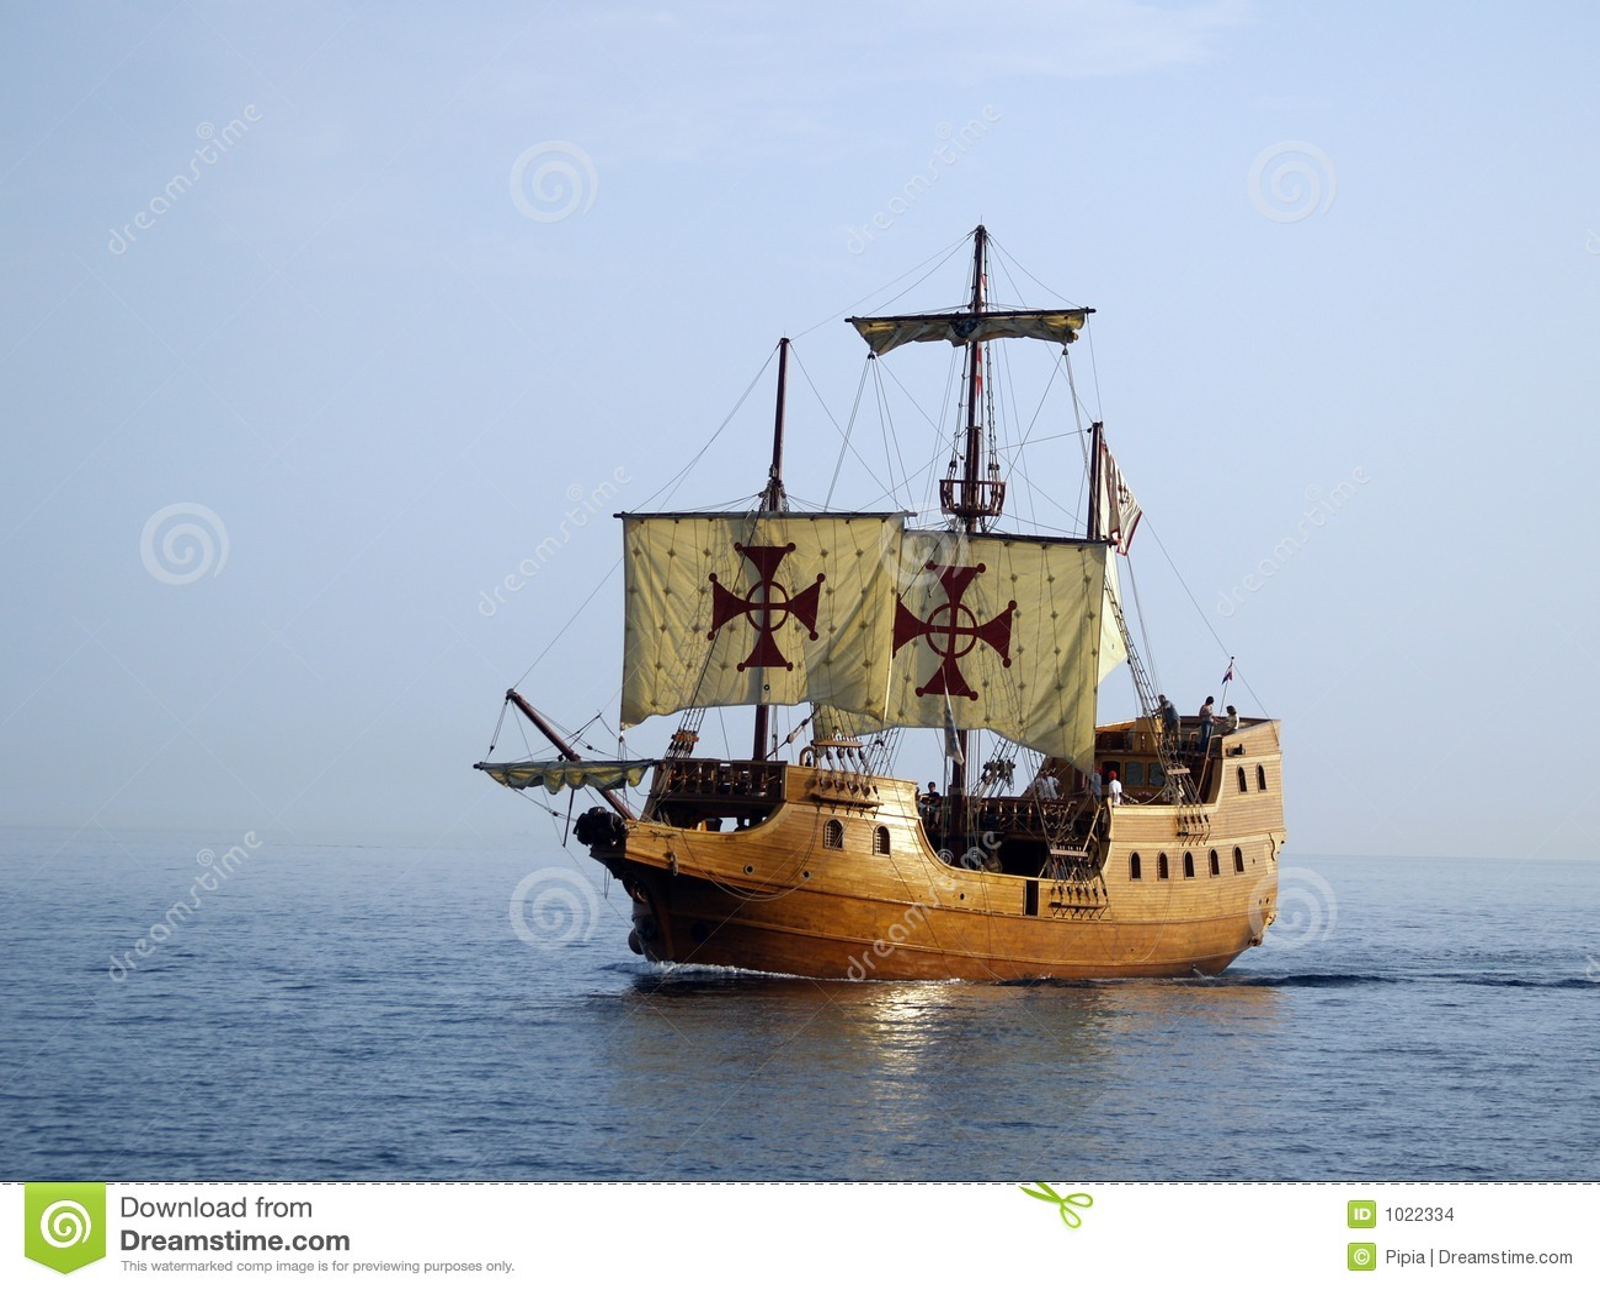 Old battle ship at sea